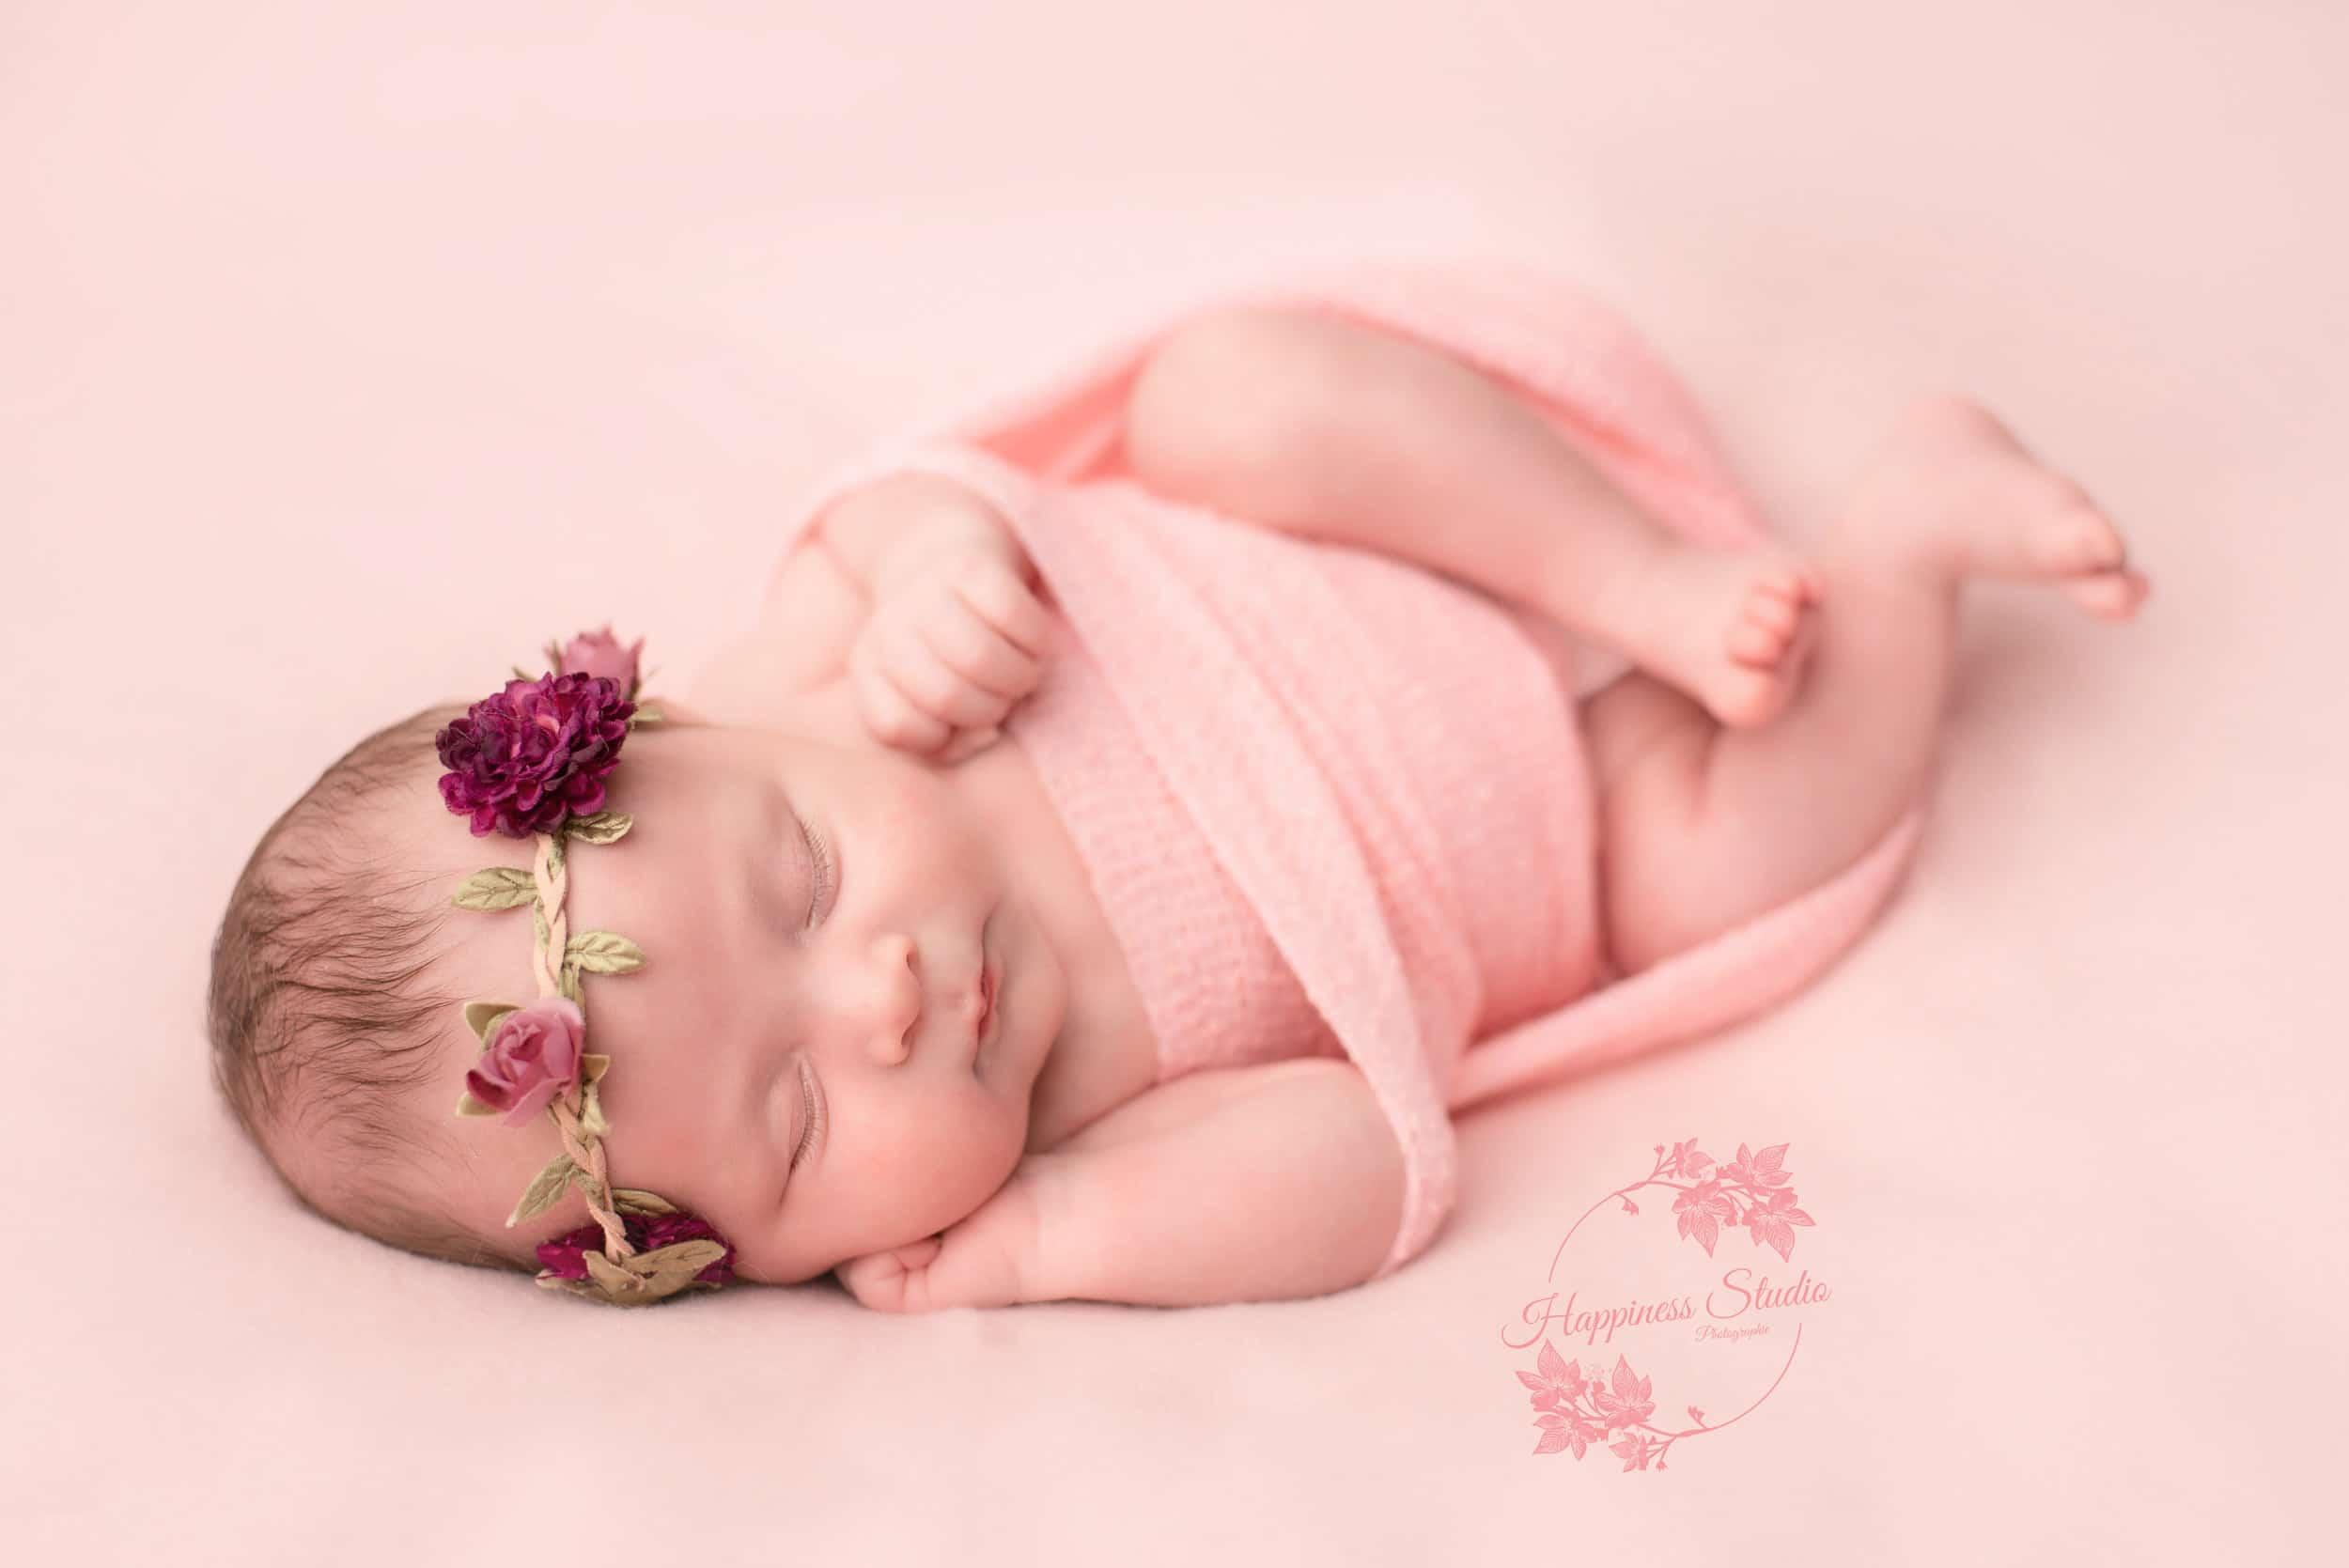 photographe-specialiste-bebe